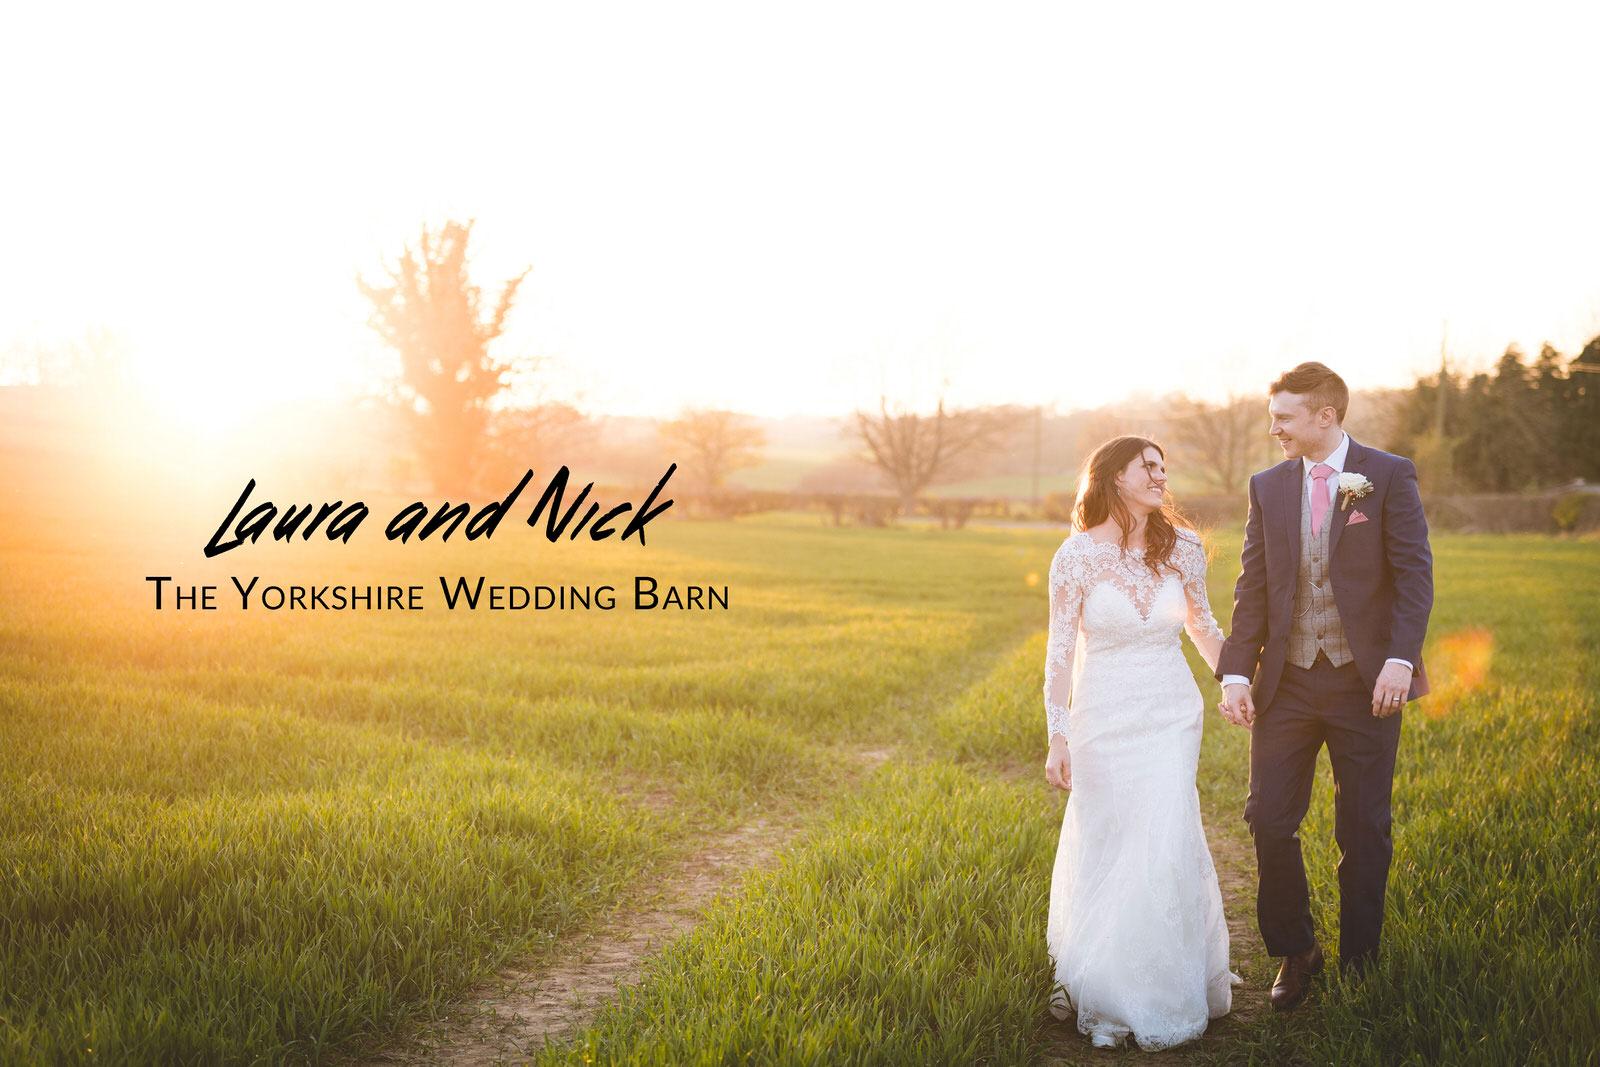 Laura and Nick's Wedding - The Yorkshire Wedding Barn